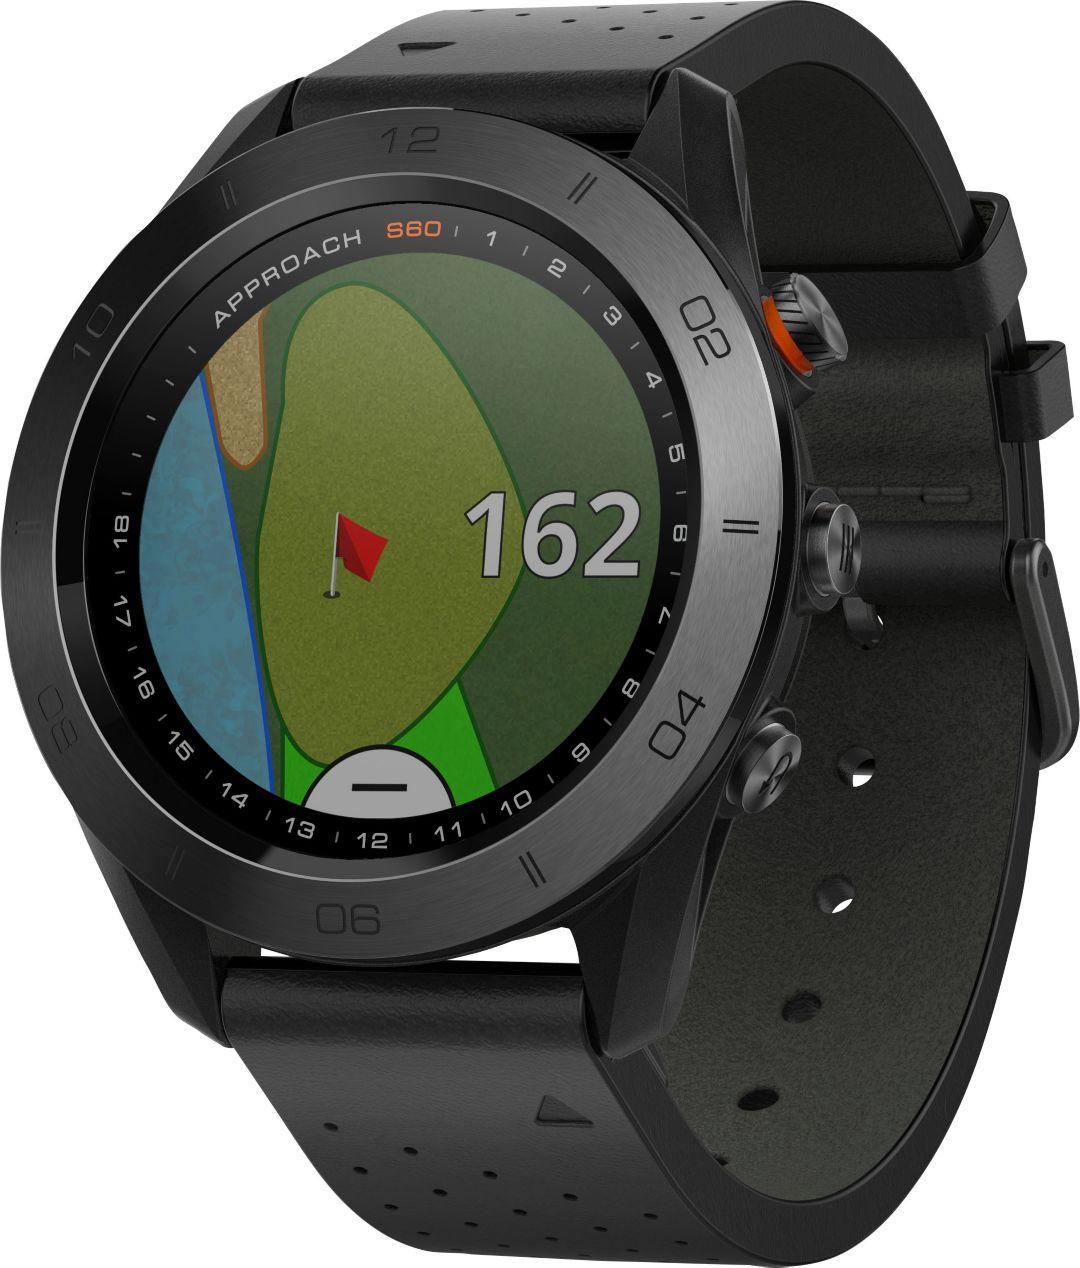 Garmin Gps Watch >> Garmin Approach S60 Premium Golf Gps Watch